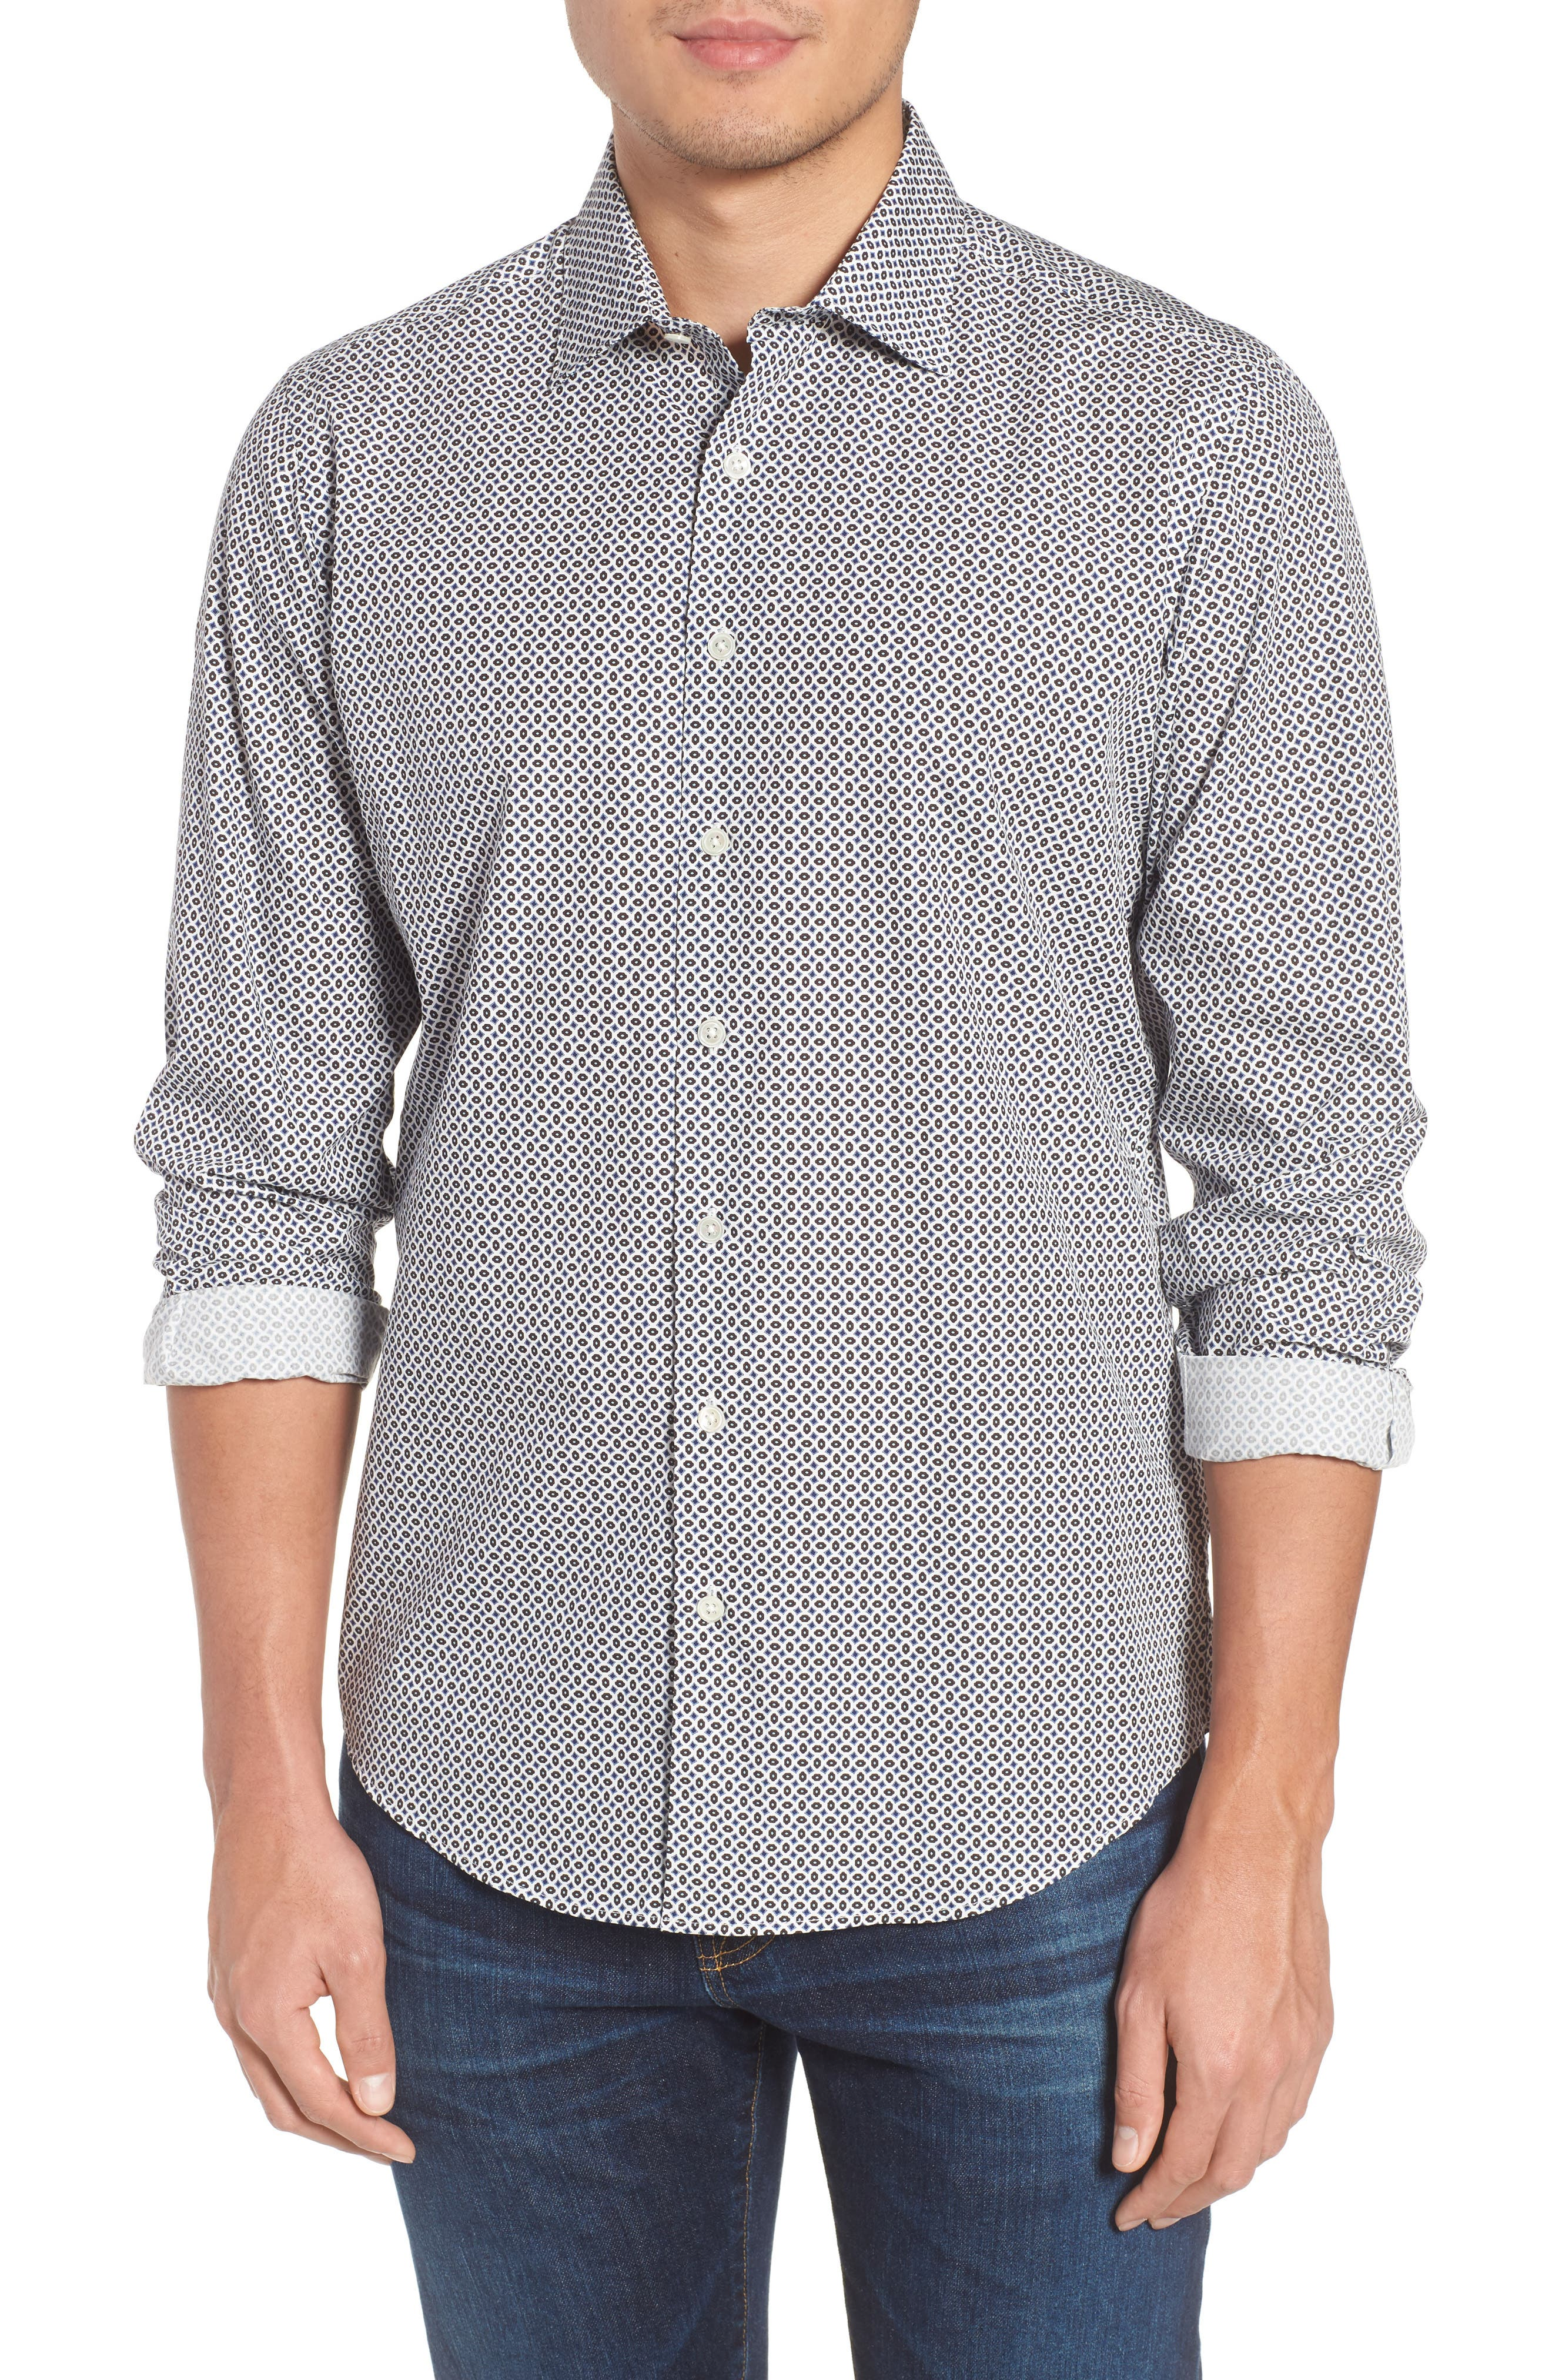 Oak House Regular Fit Sport Shirt,                             Main thumbnail 1, color,                             Ivory